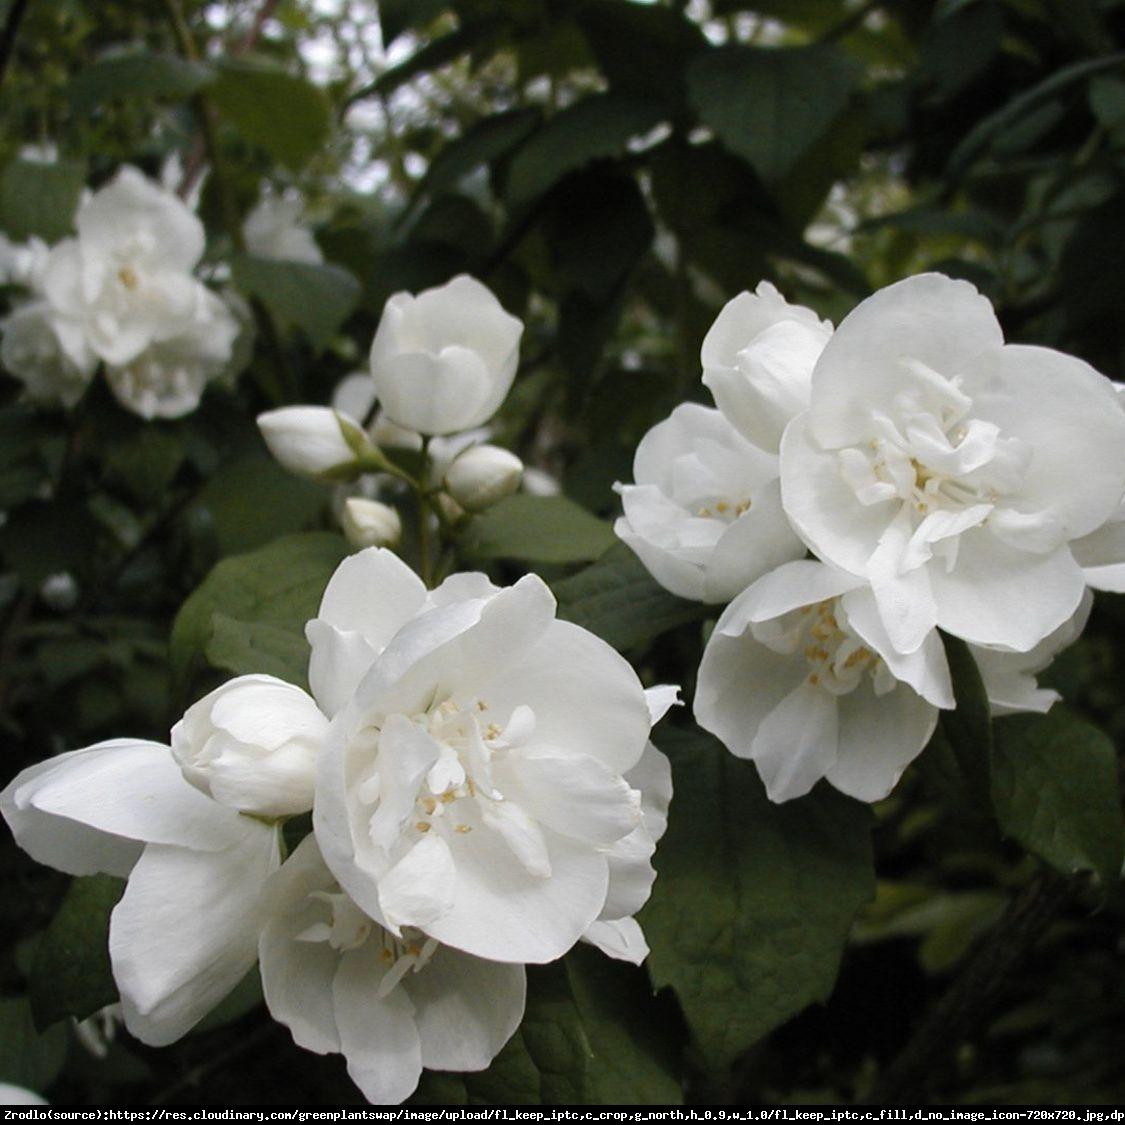 jaśminowiec dame blanche - philadelphus dame blanche